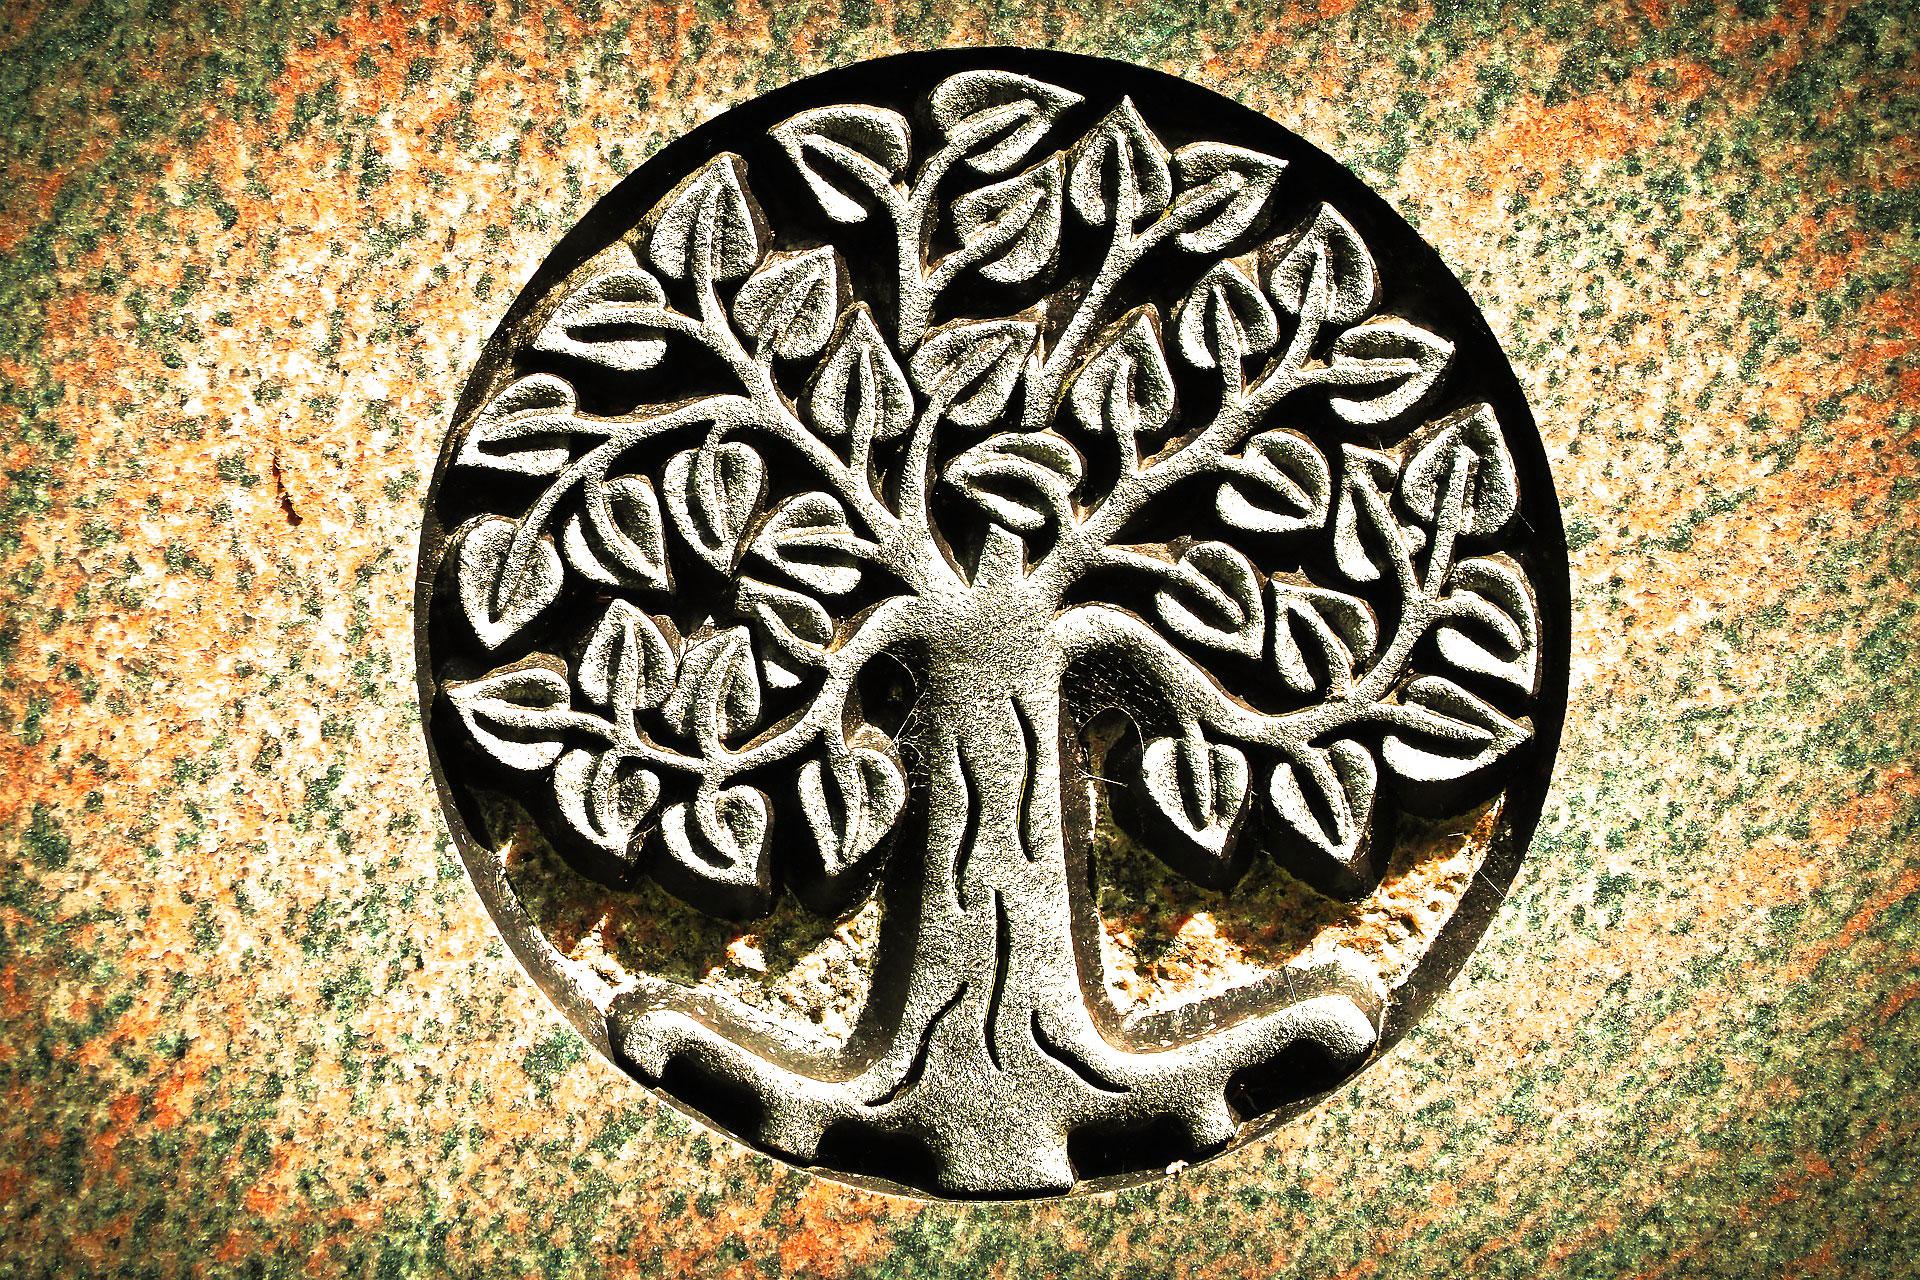 Keltische Symbole Bedeutung